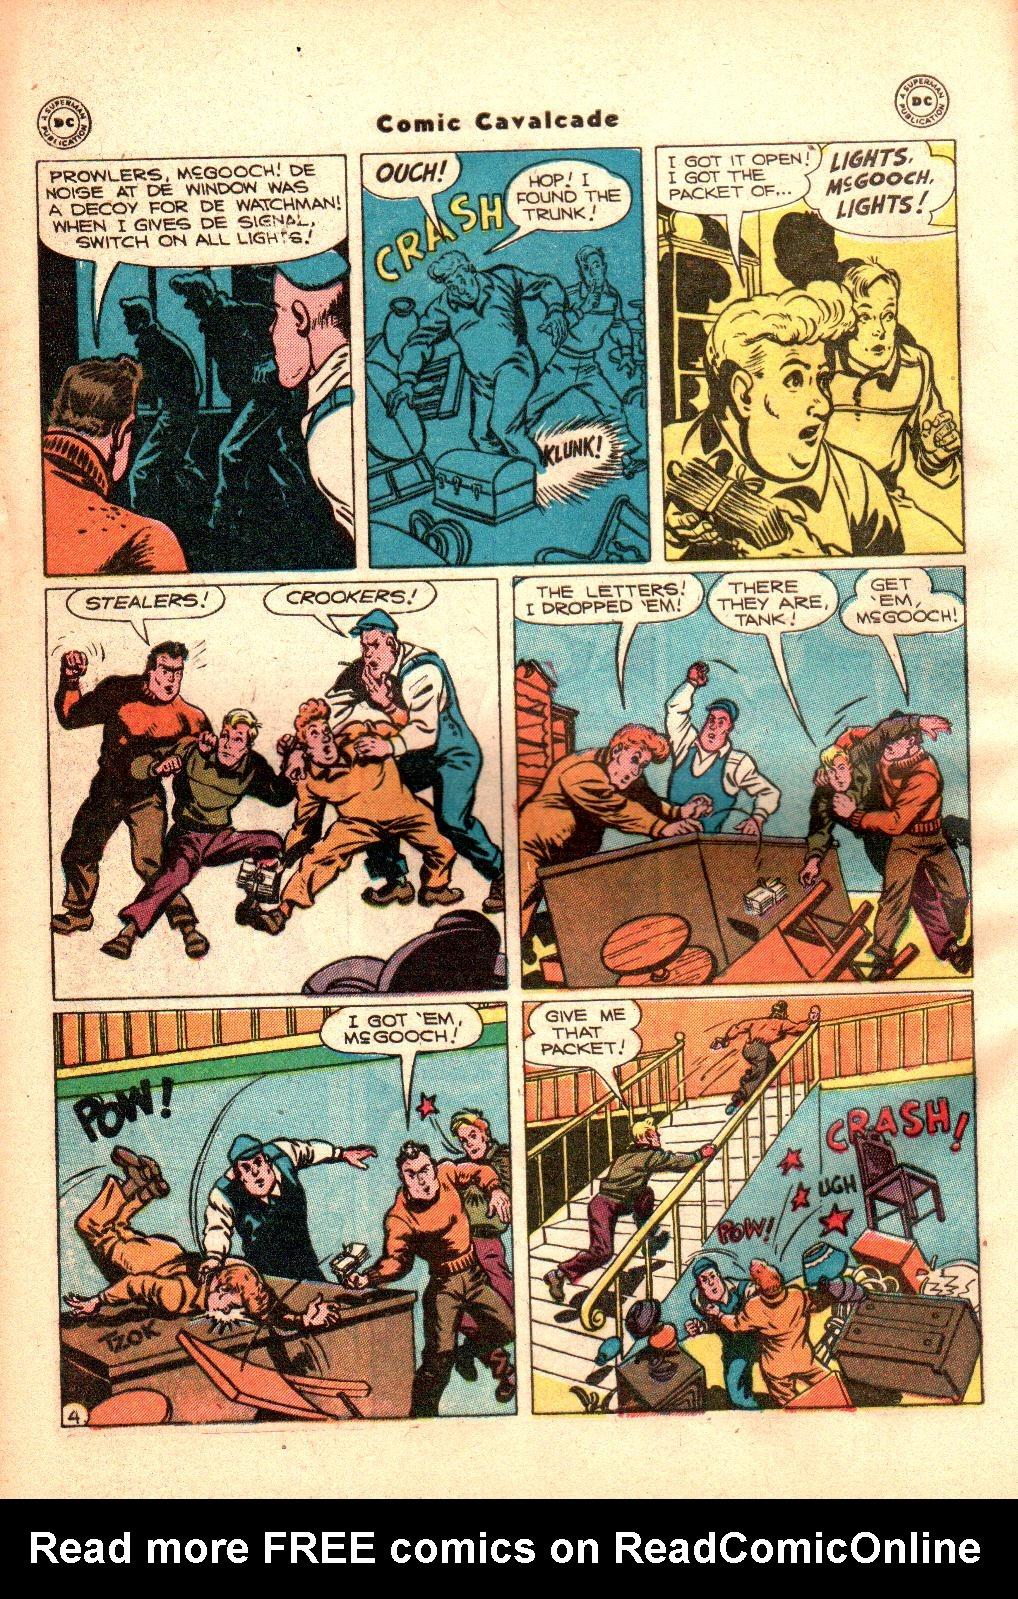 Comic Cavalcade issue 21 - Page 46